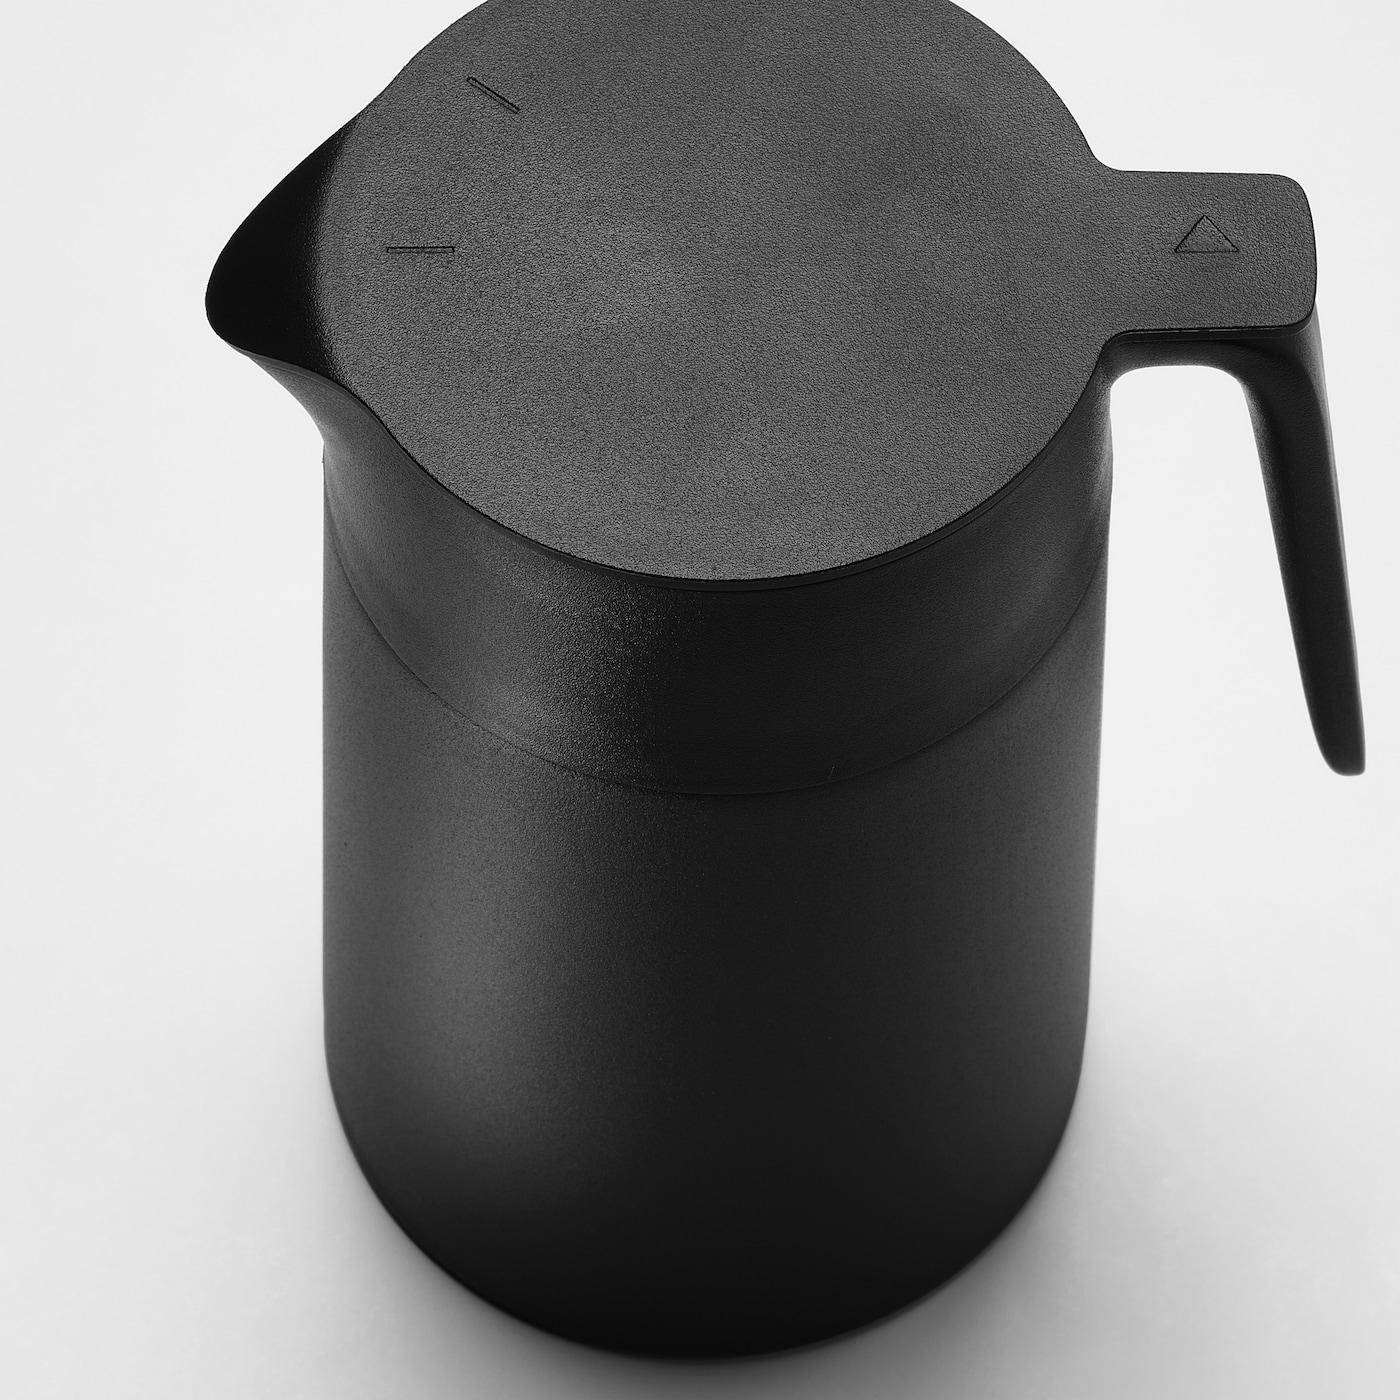 UNDERLÄTTA Vacuum flask, black, 41 oz